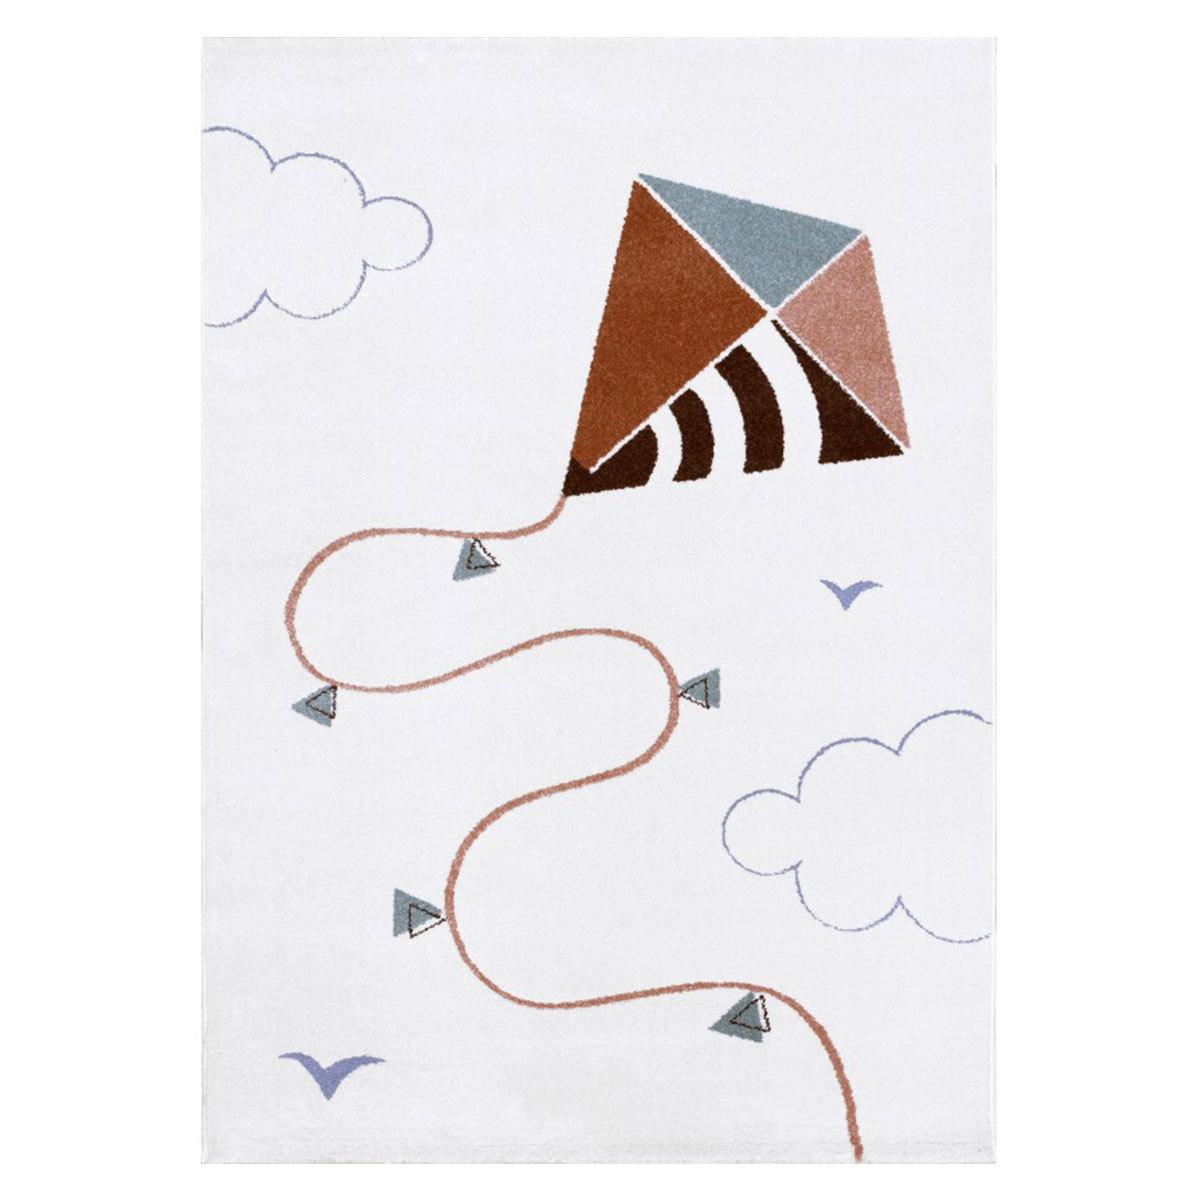 Tapis Tapis Cerf-Volant - 100 x 150 cm Tapis Cerf-Volant - 100 x 150 cm